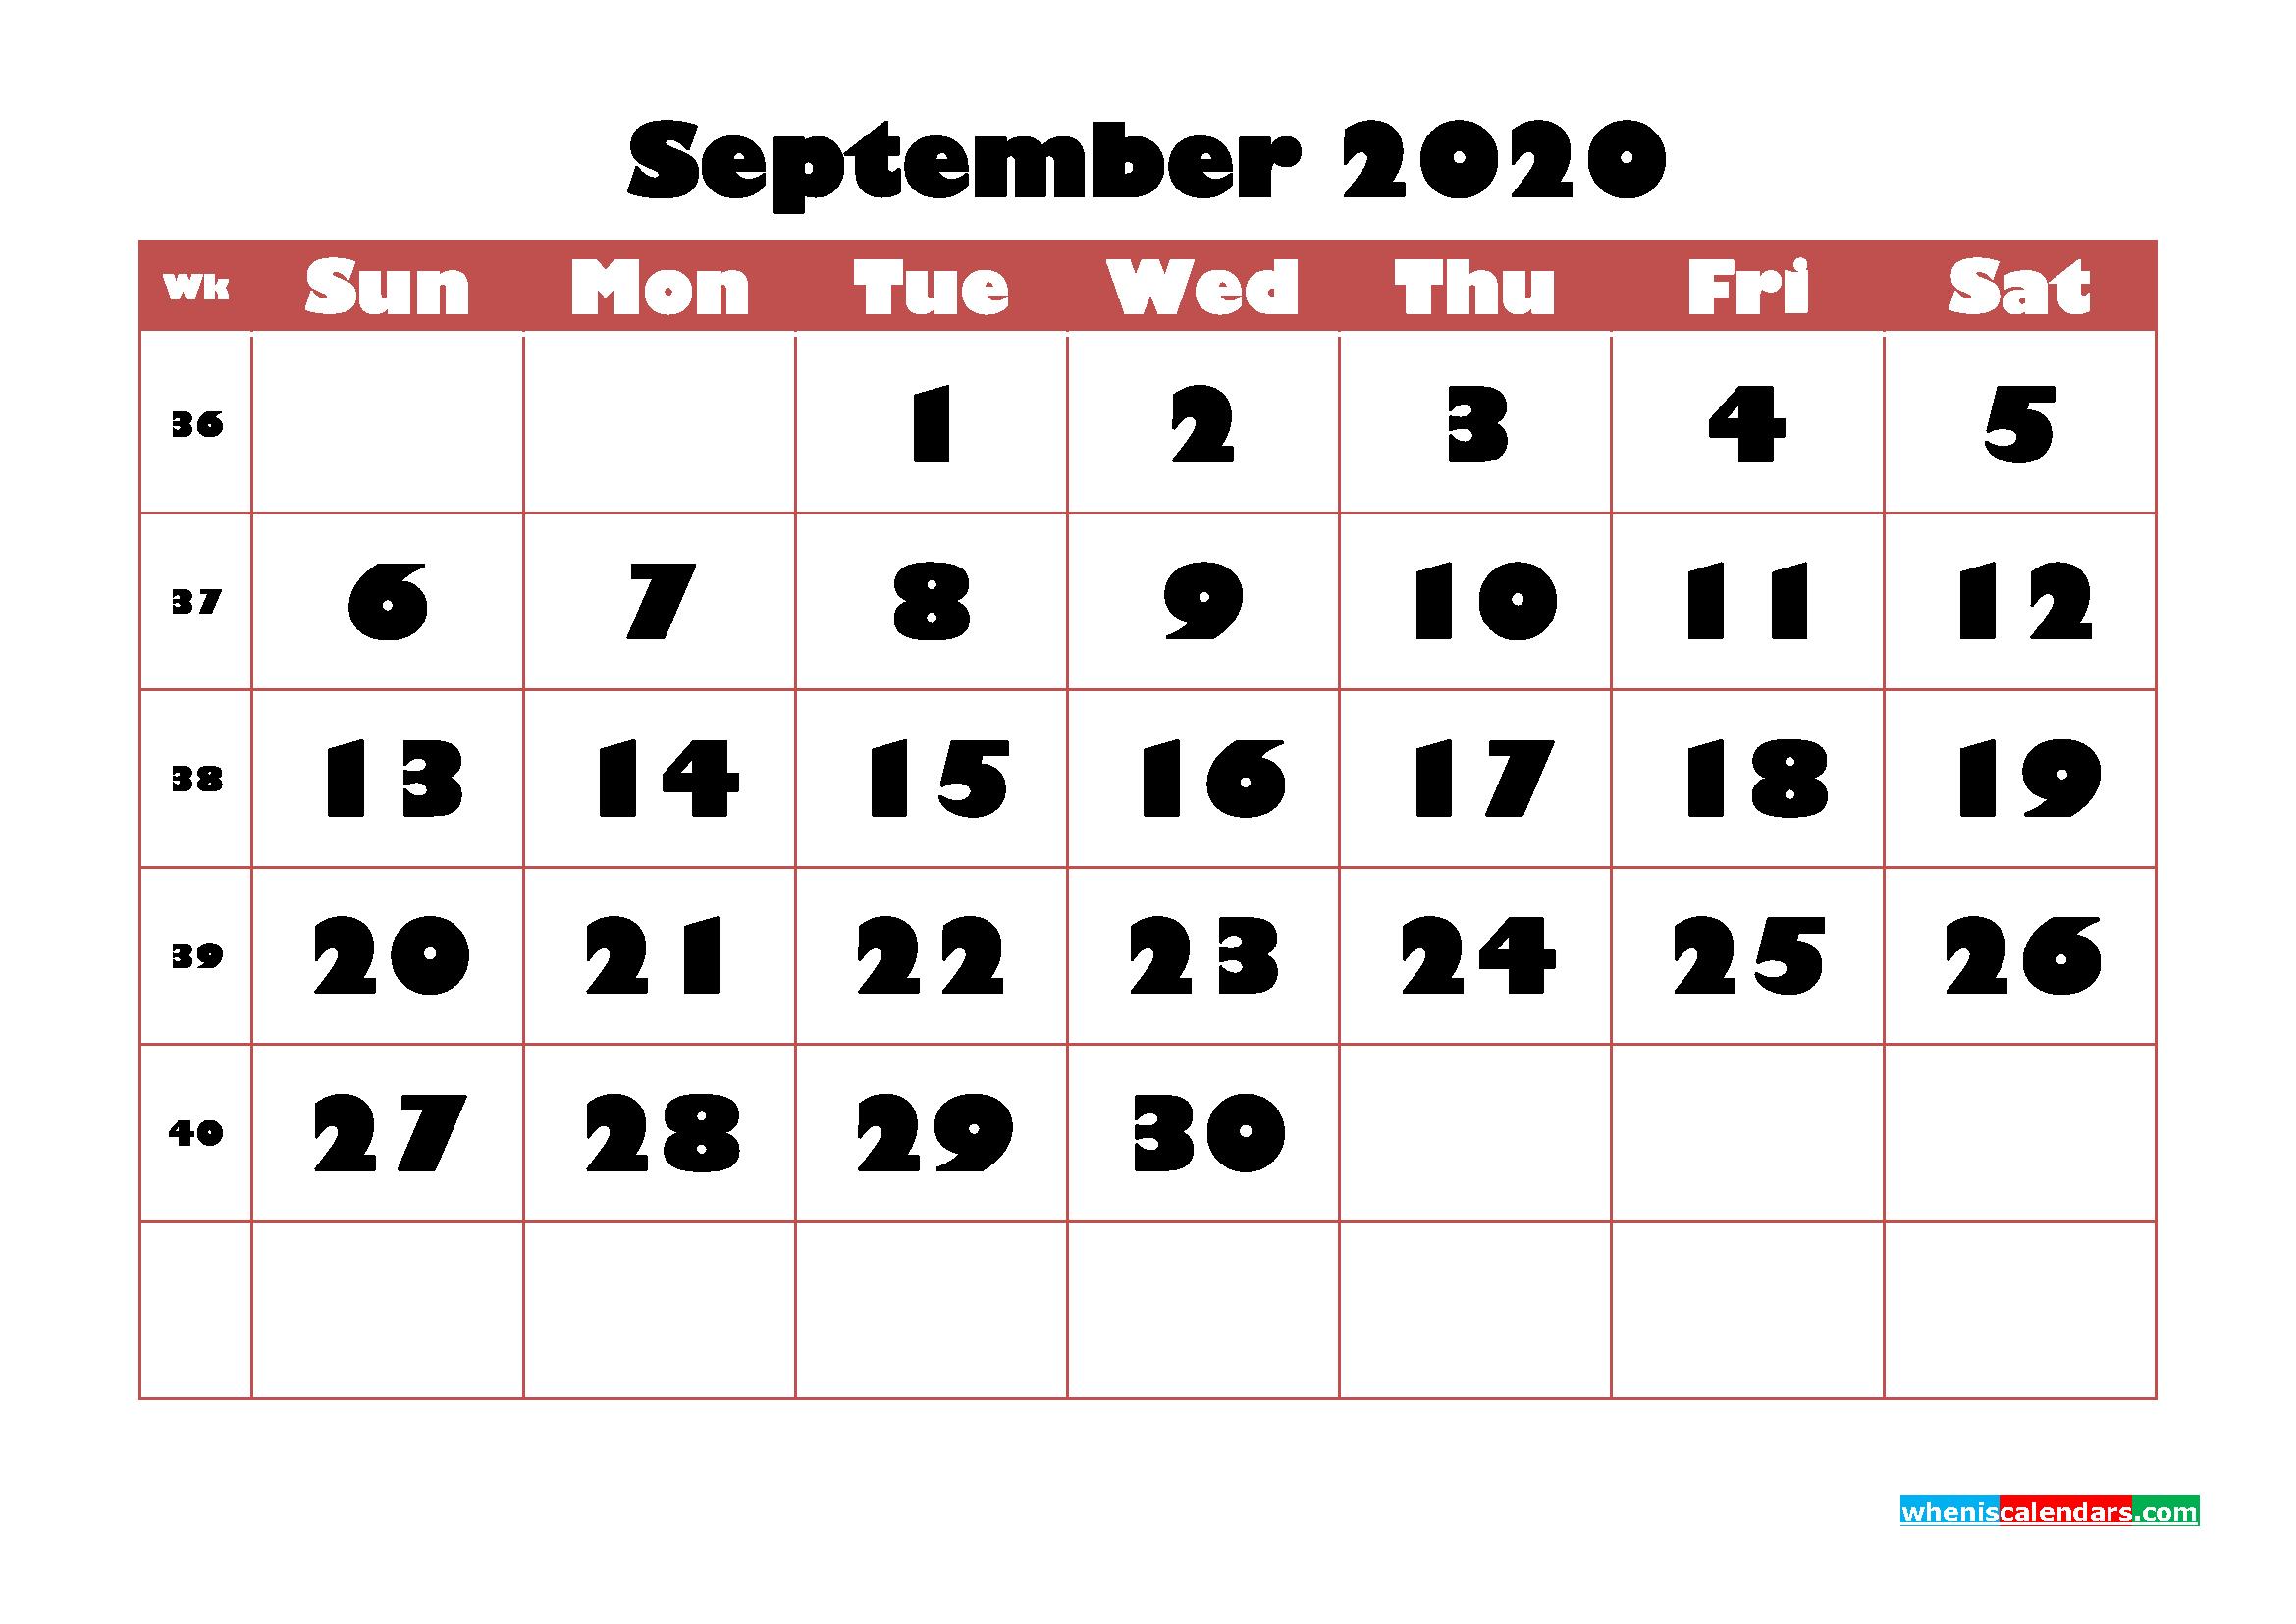 Free Printable Calendar September 2020 PDF, Word - No.m20b729